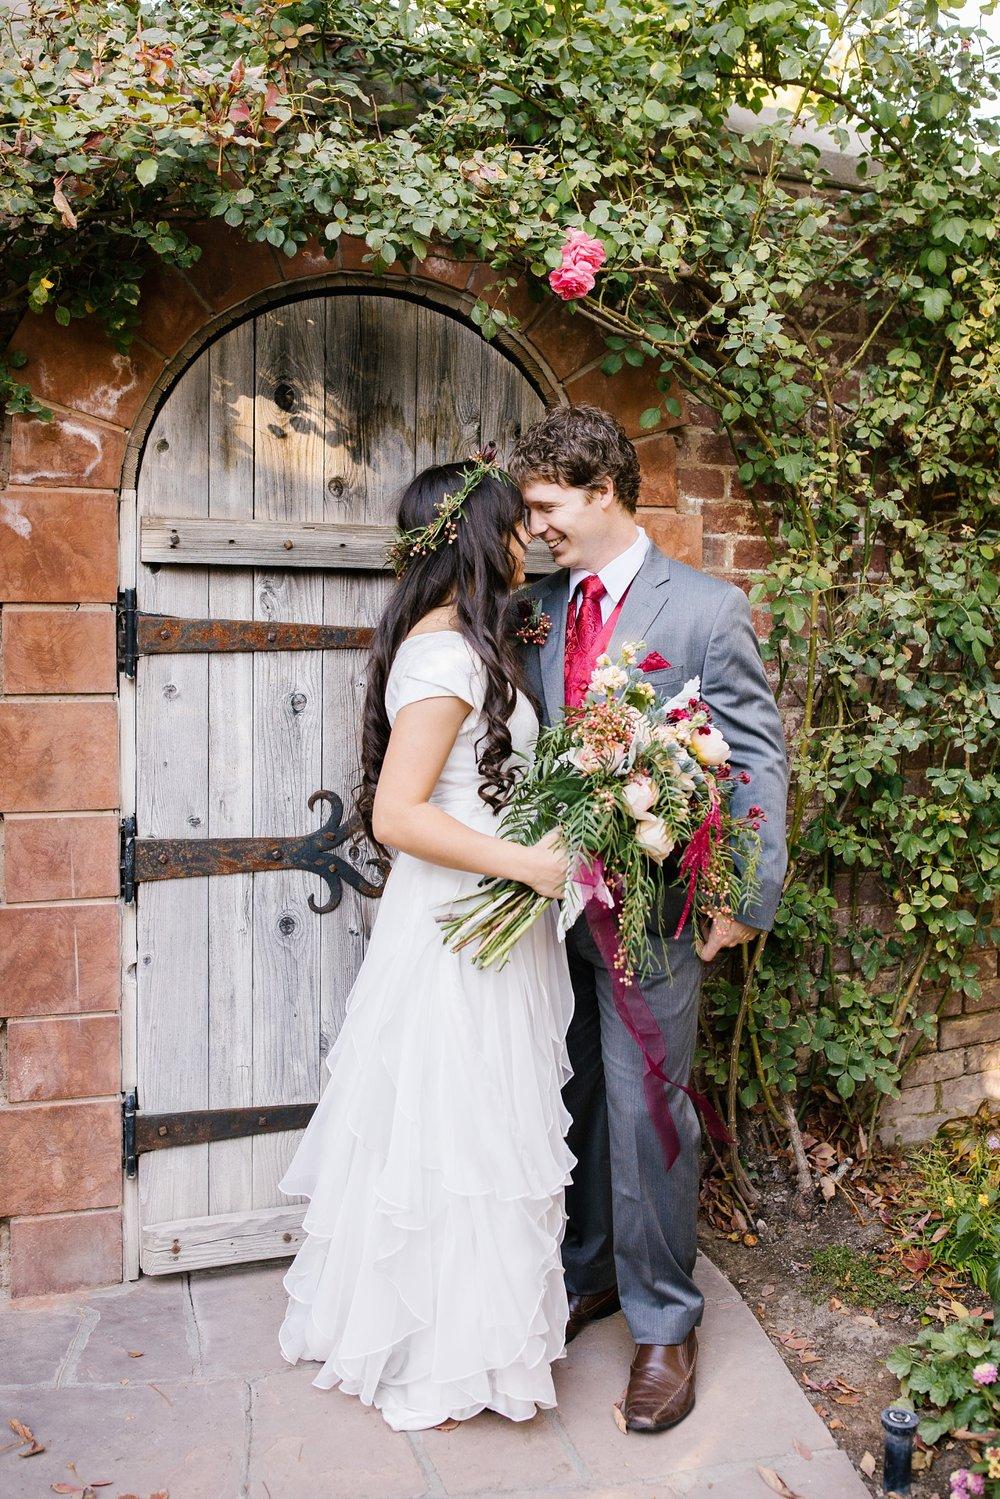 JB-Bridals-30_Lizzie-B-Imagery-Utah-Wedding-Photographer-Thanksgiving-Point-Ashton-Gardens-Lehi-Utah.jpg